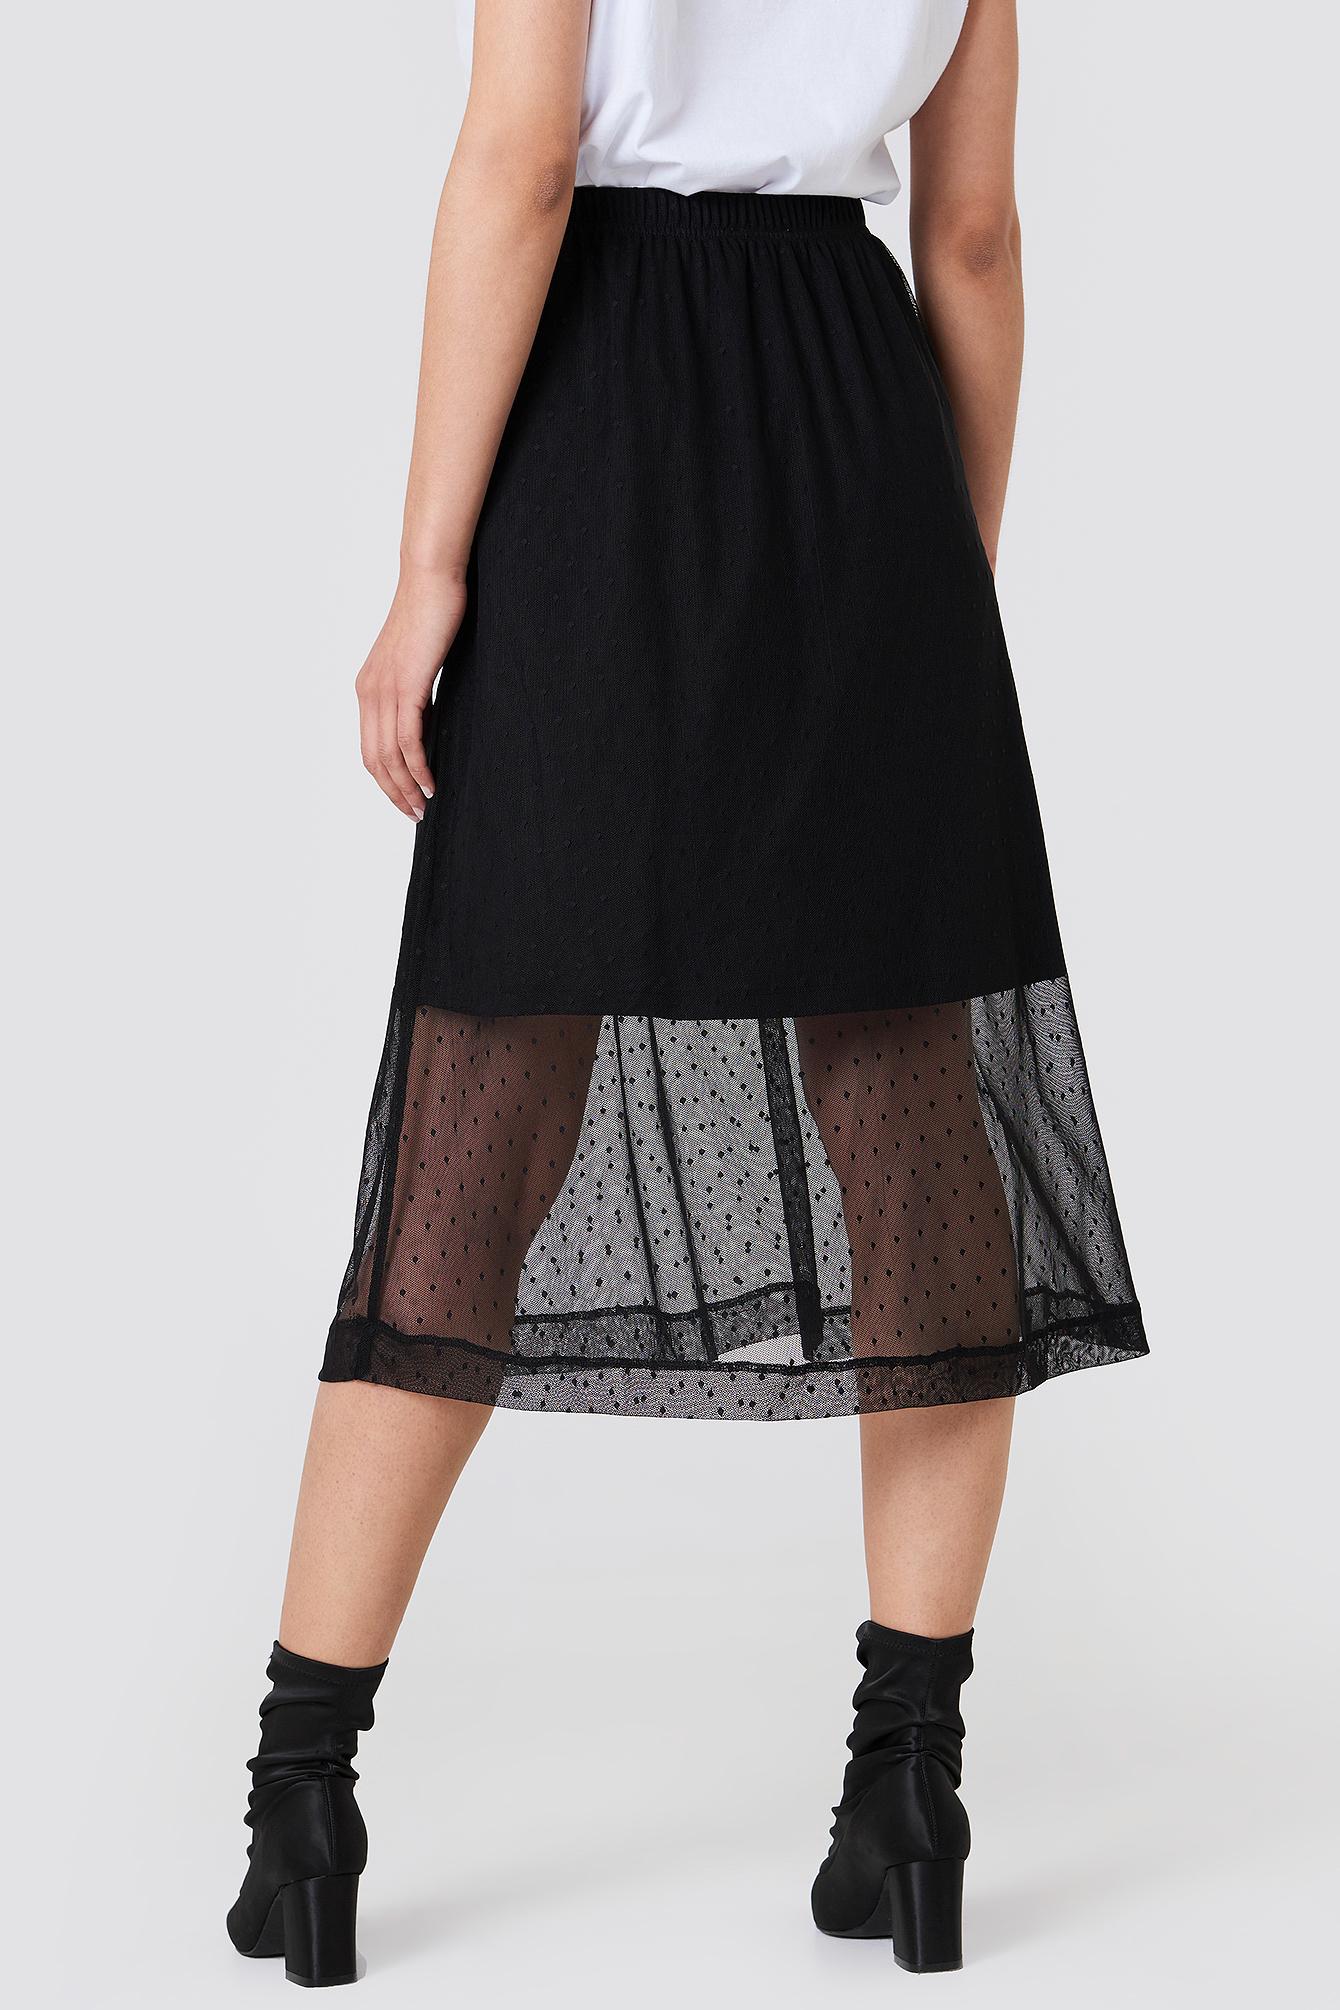 Caradee Dot Skirt NA-KD.COM